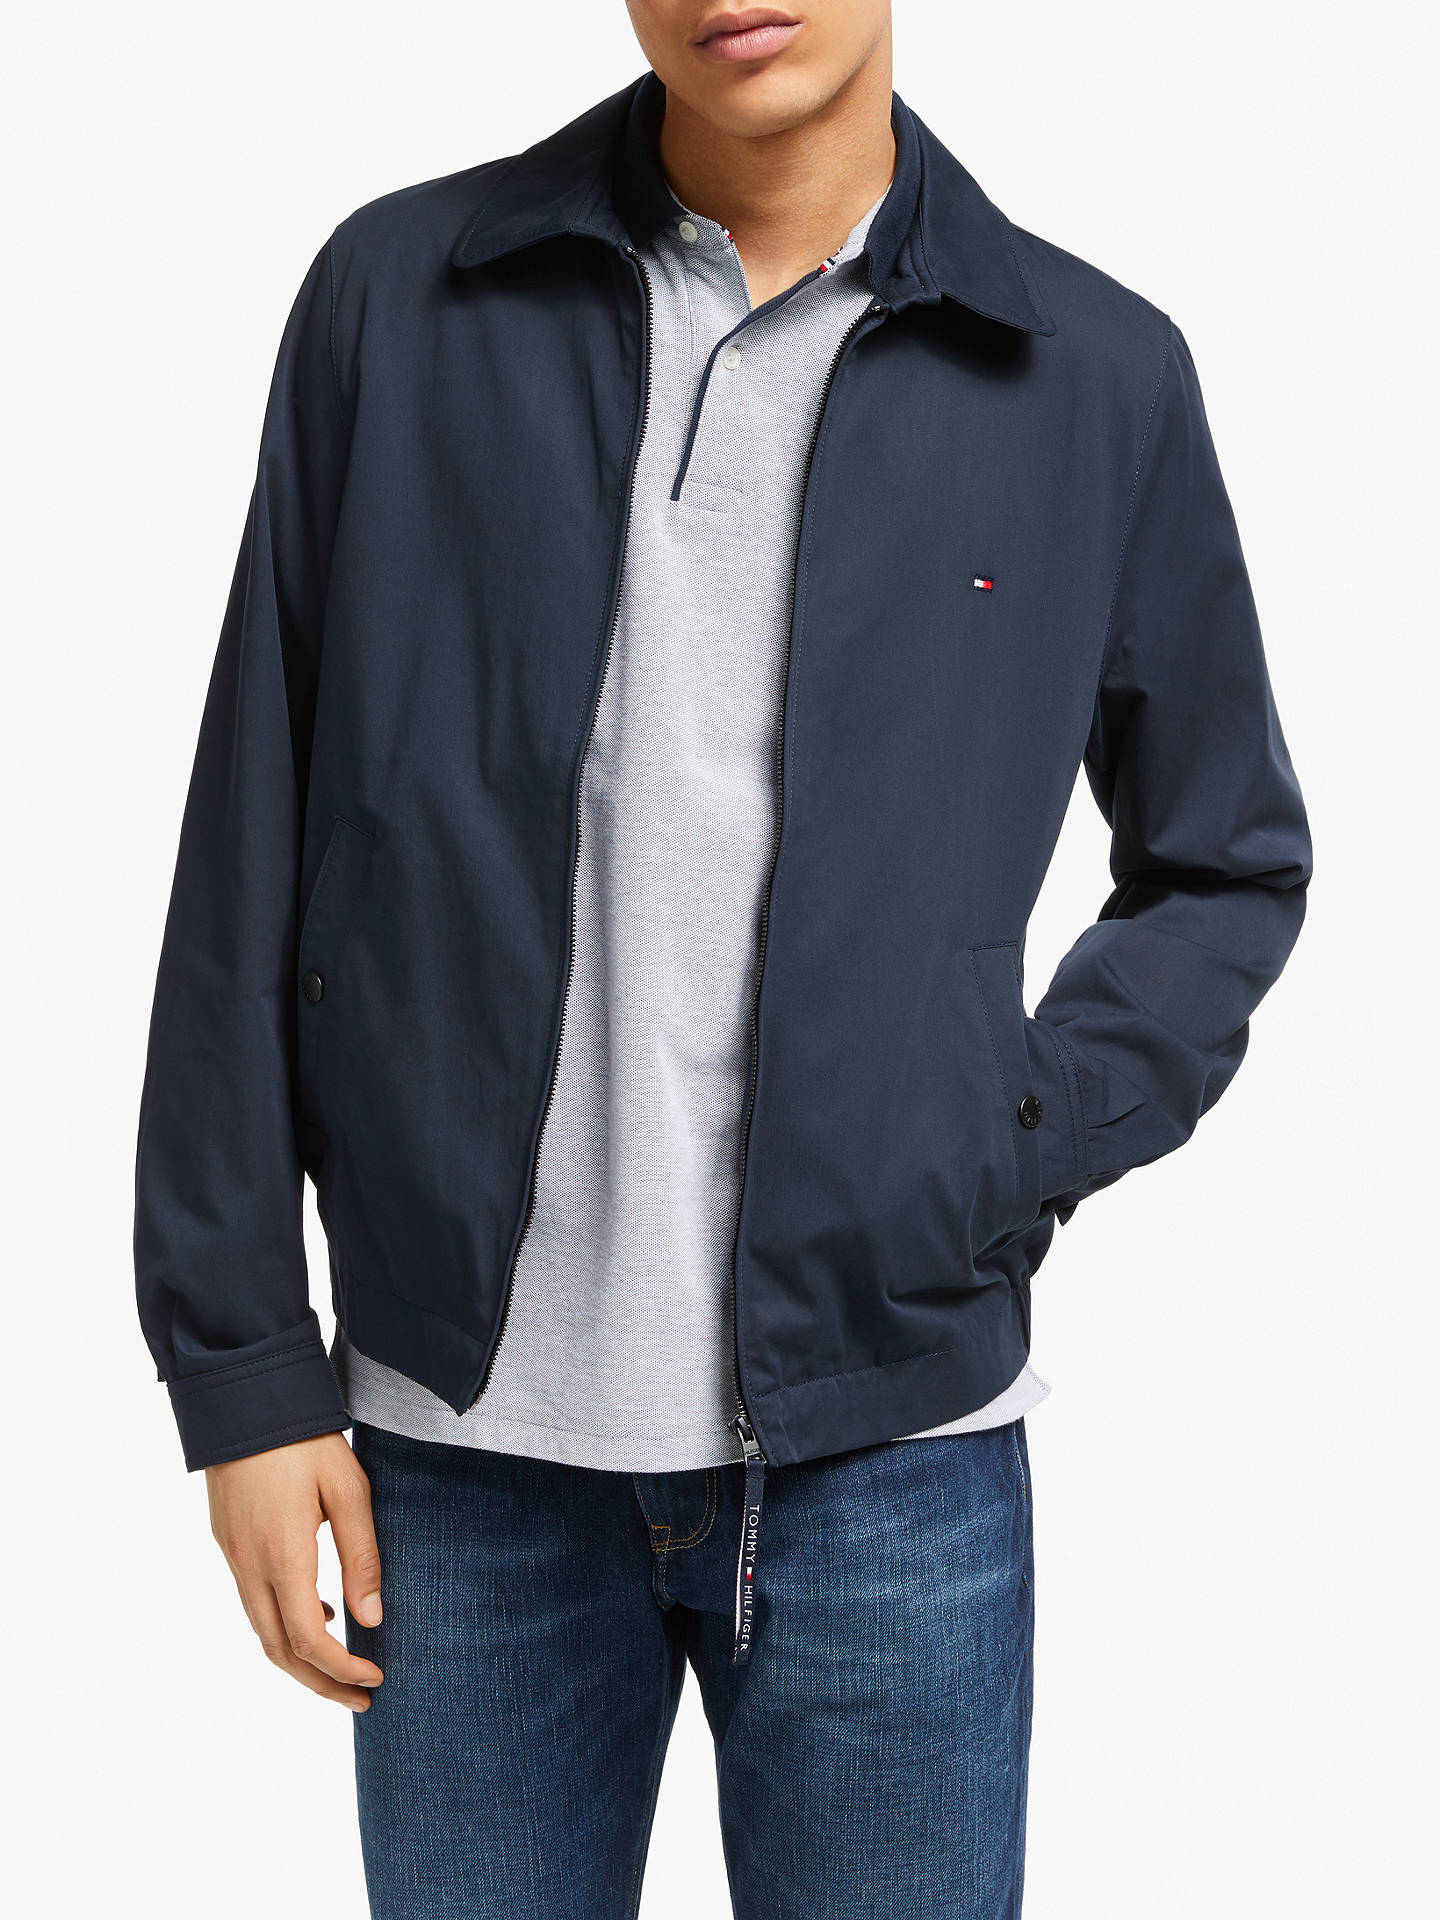 6565c94d Buy Tommy Hilfiger New Ivy Jacket, Sky Captain, XL Online at johnlewis.com  ...